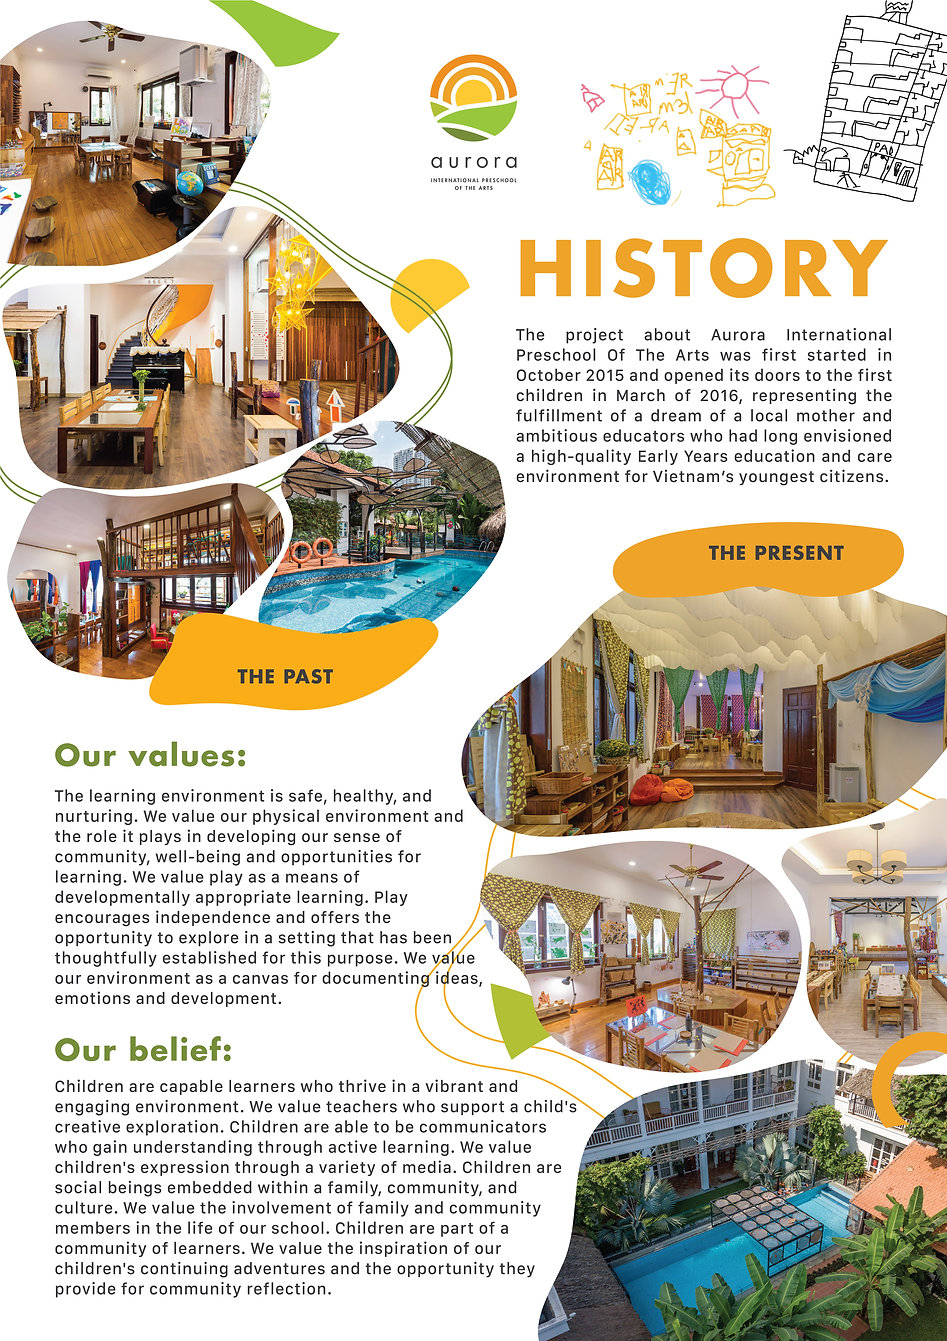 aurora history